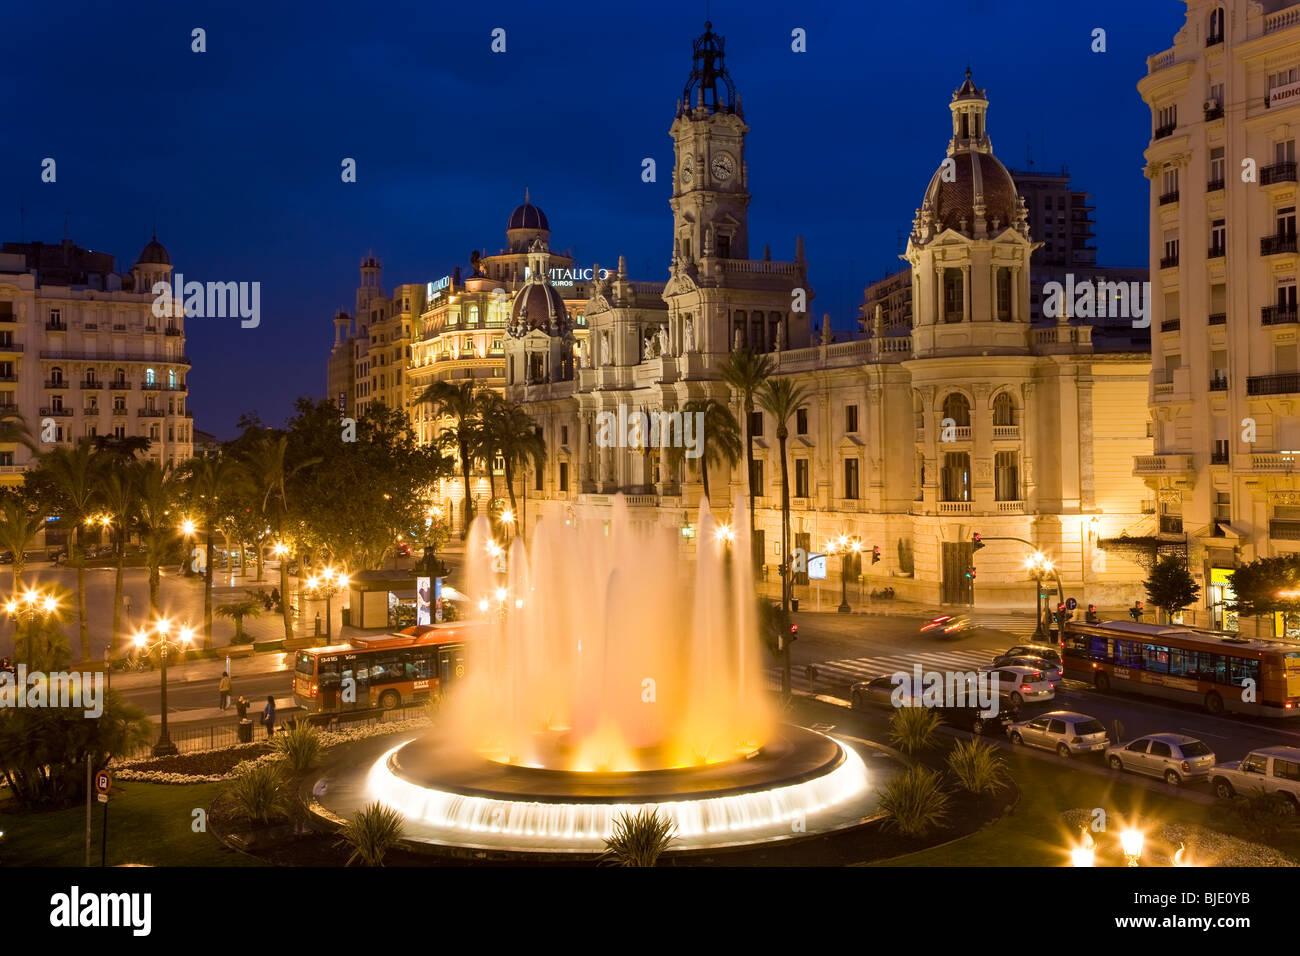 Das Rathaus & Fountain Plaza del Aguntamiento Valencia Costa del Azahar Provinz Valencia, Spanien Stockbild